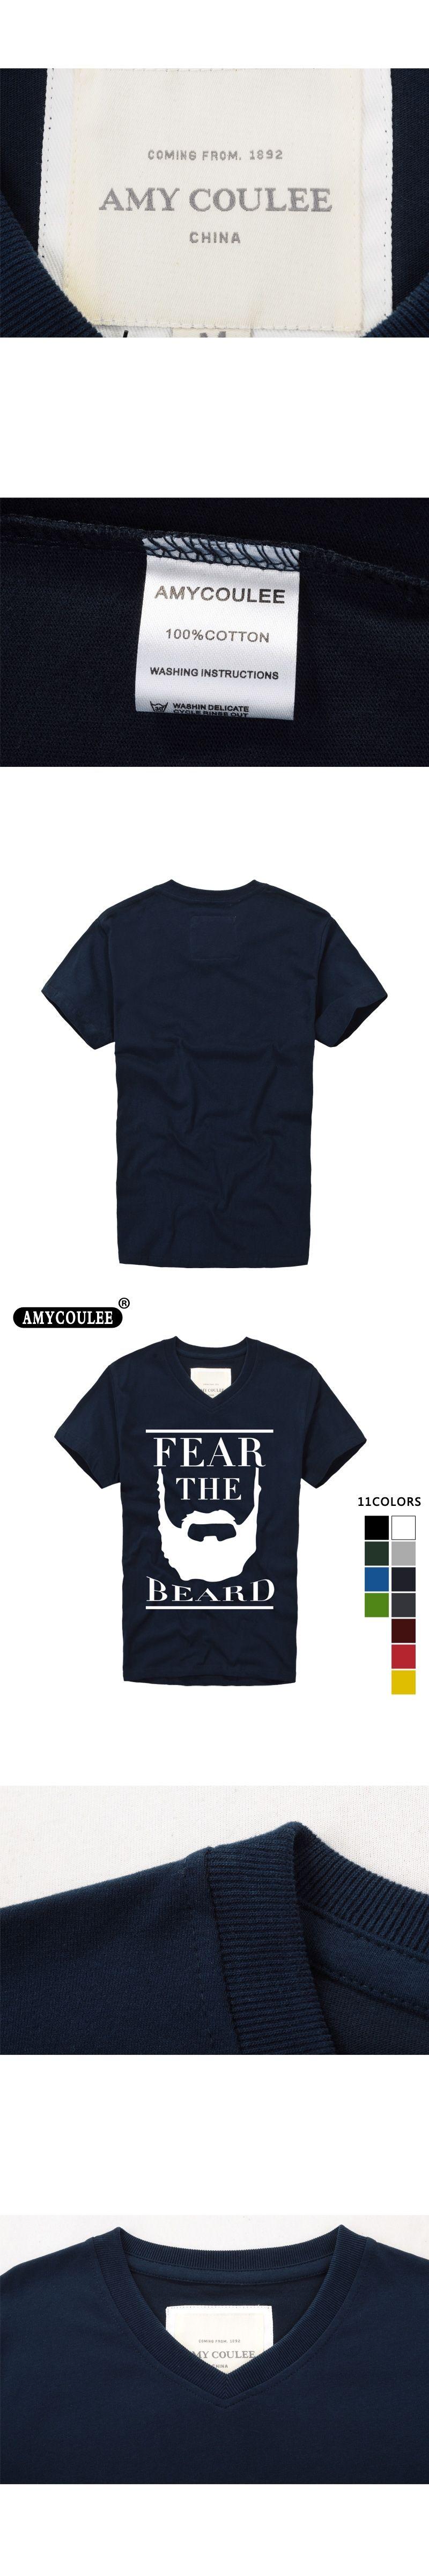 732cc697ab47 Fashion Design T shirt print James Harden Fear the Beard Mens   Womens V  neck T Shirt Custom T Shirt camisetas hombre tshirt